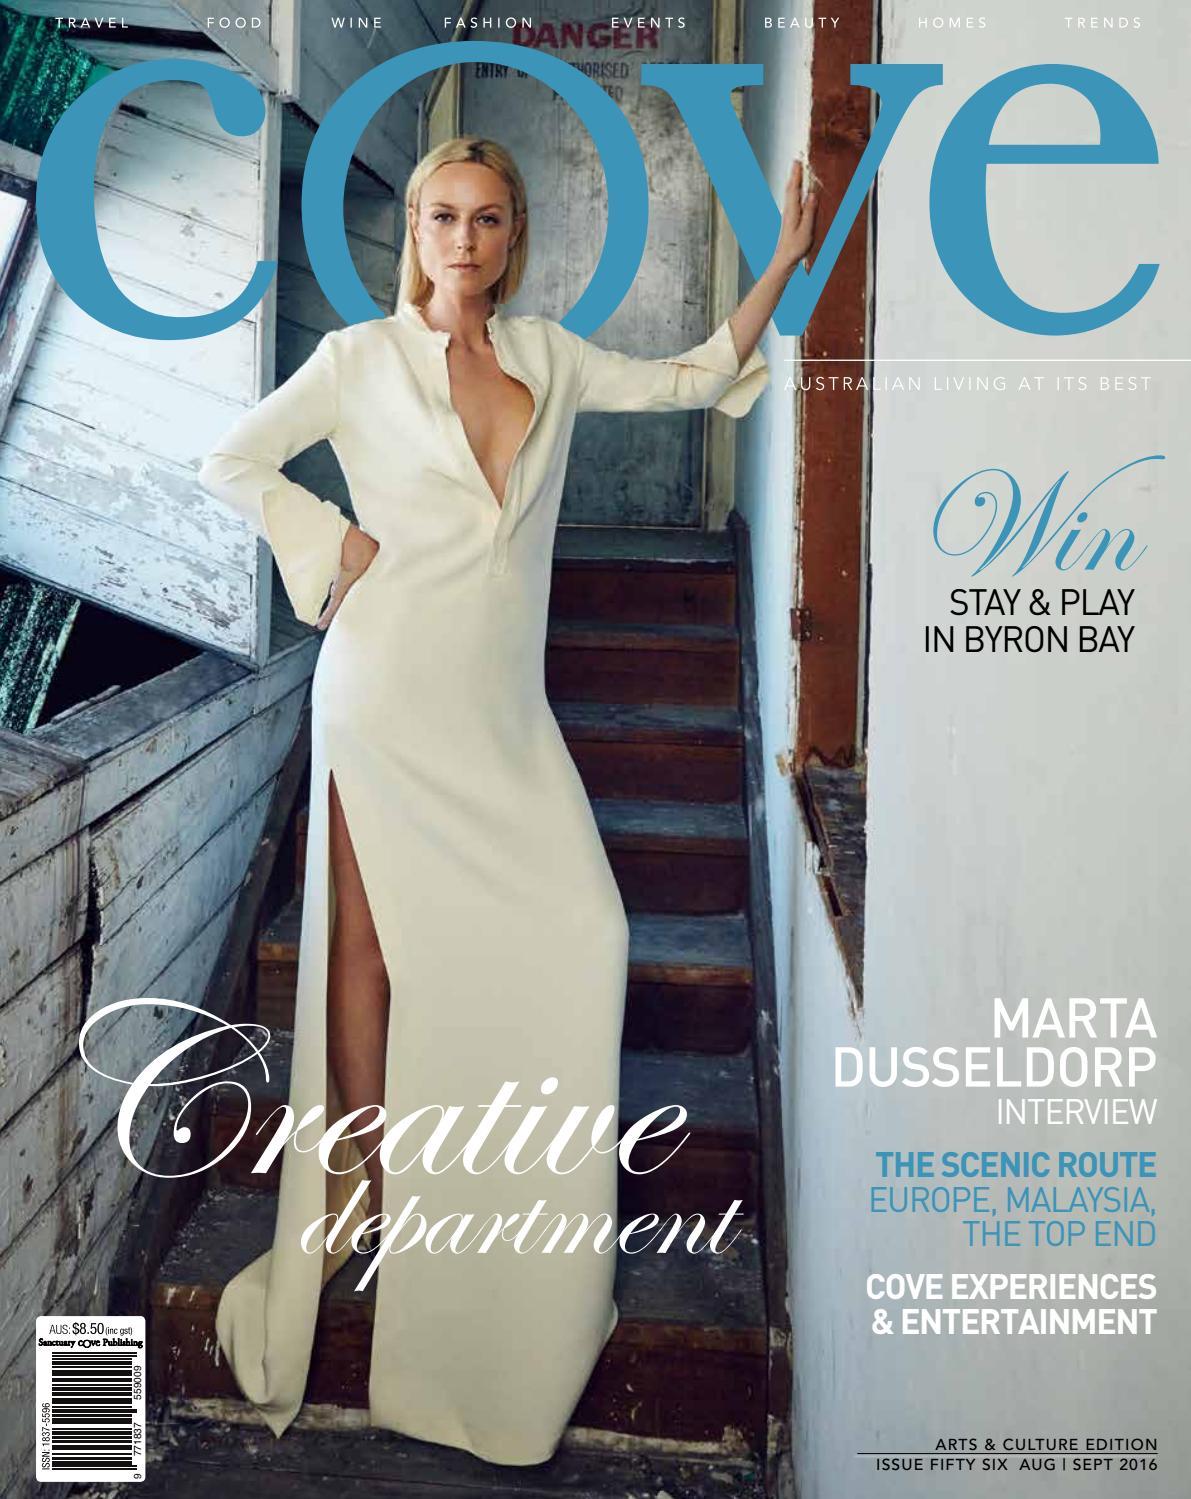 8012a66779b The Cove Magazine by The Cove Magazine - issuu